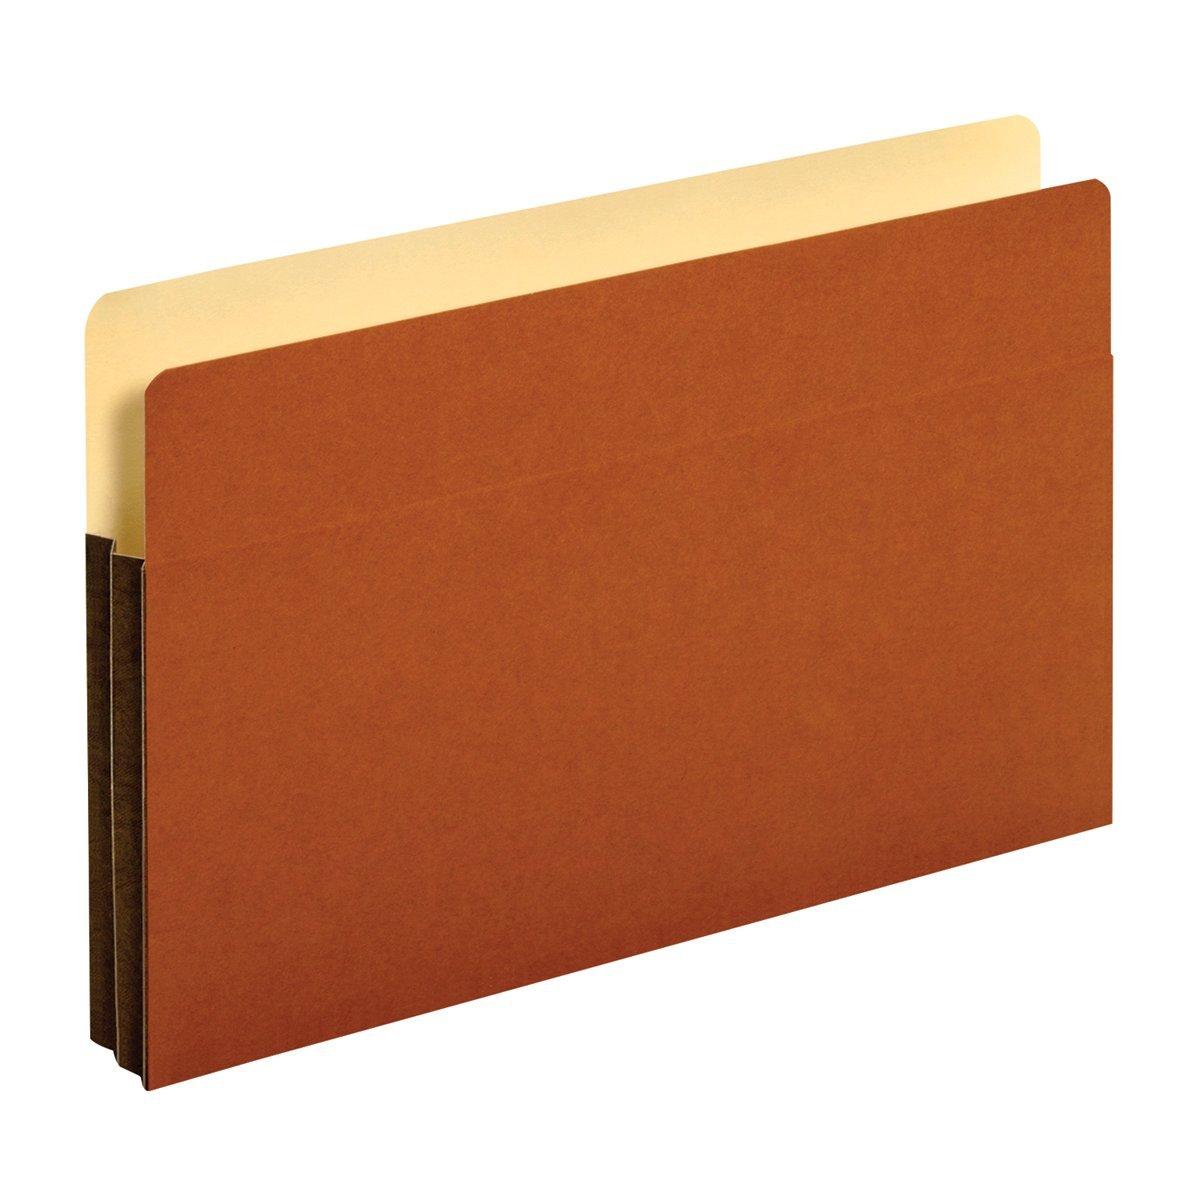 Globe-Weis/Pendaflex Tyvek File Pockets, 1.75-Inch Expansion, Legal Size, Brown, 25 Pockets Per Box (64254)